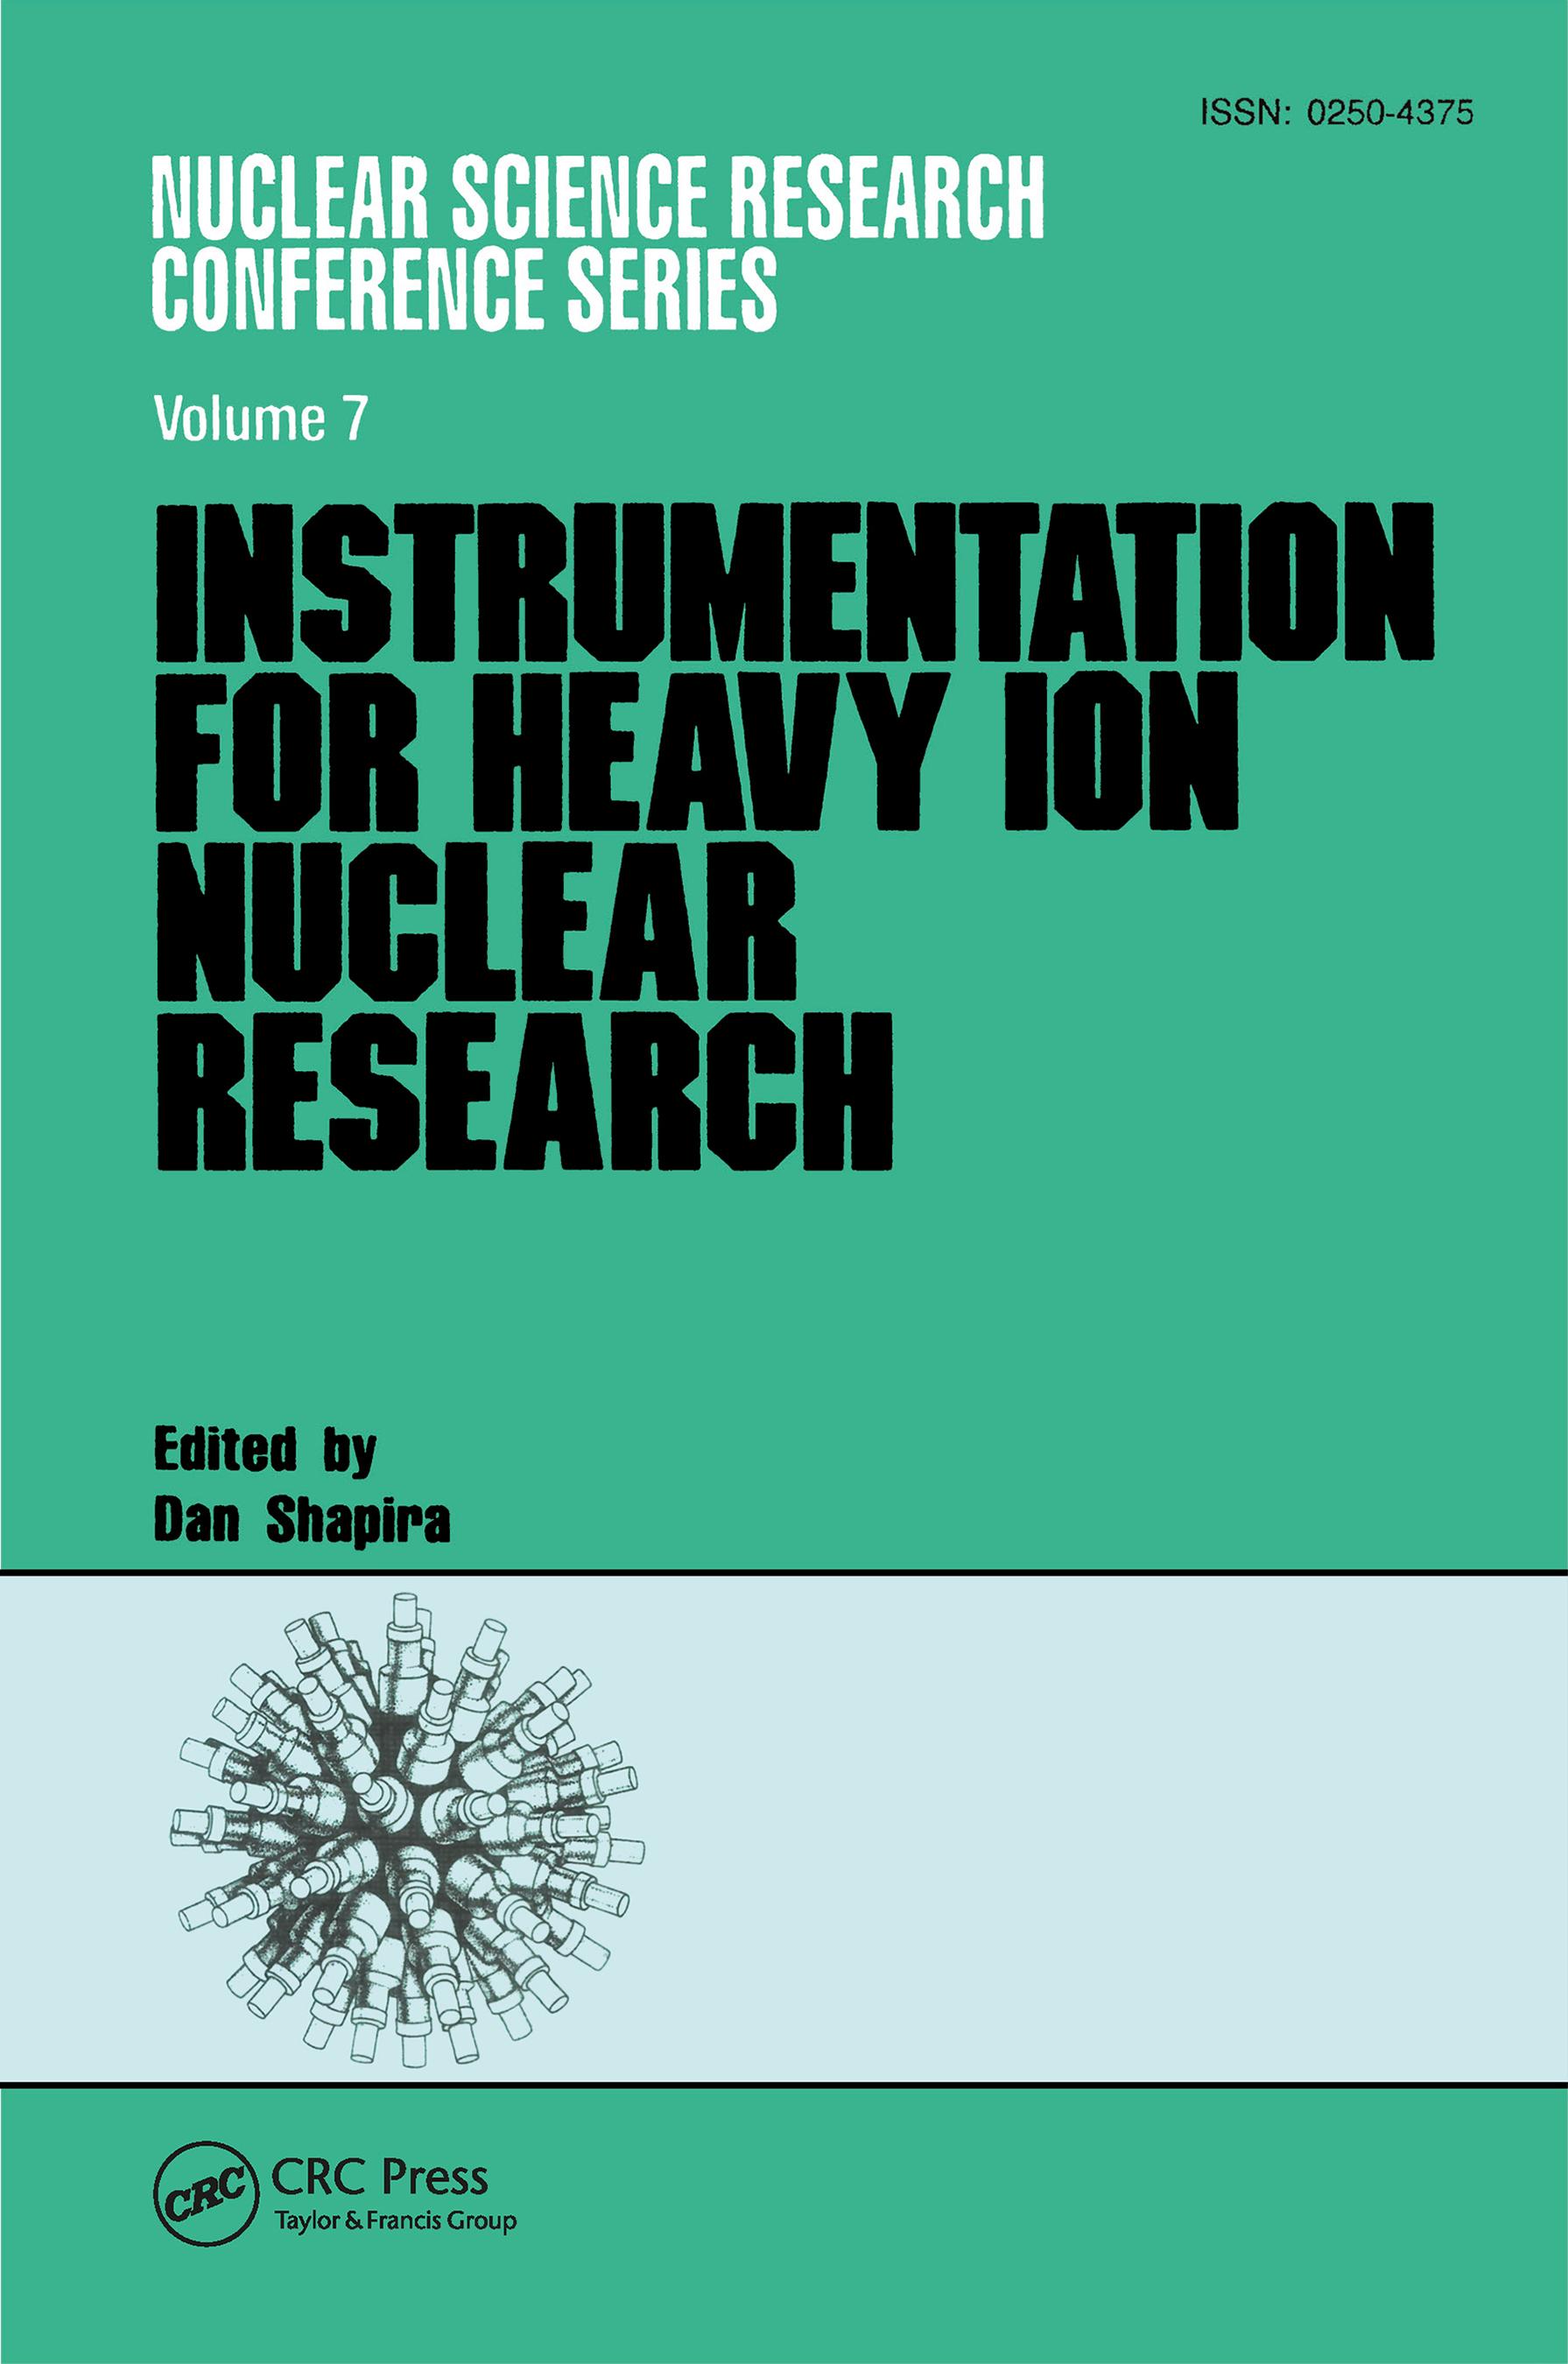 Plastic Scintillator Detectors for the Study of Transfer and Breakup Reactions at Intermediate Energies